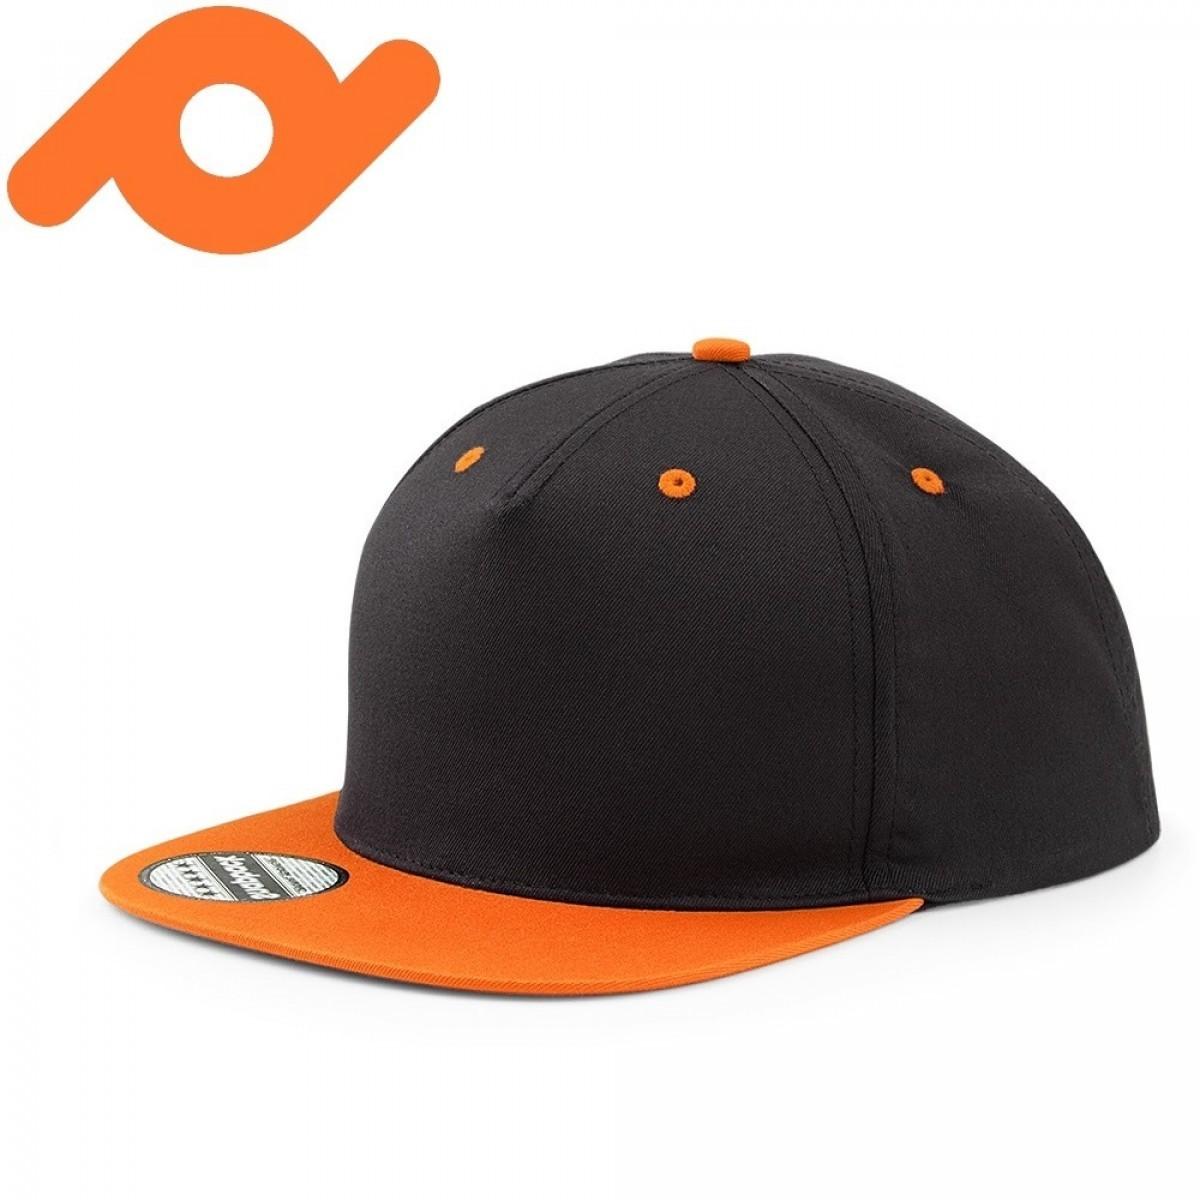 Senvi Snapback met Platte Klep Zwart/Oranje (One size fits all)